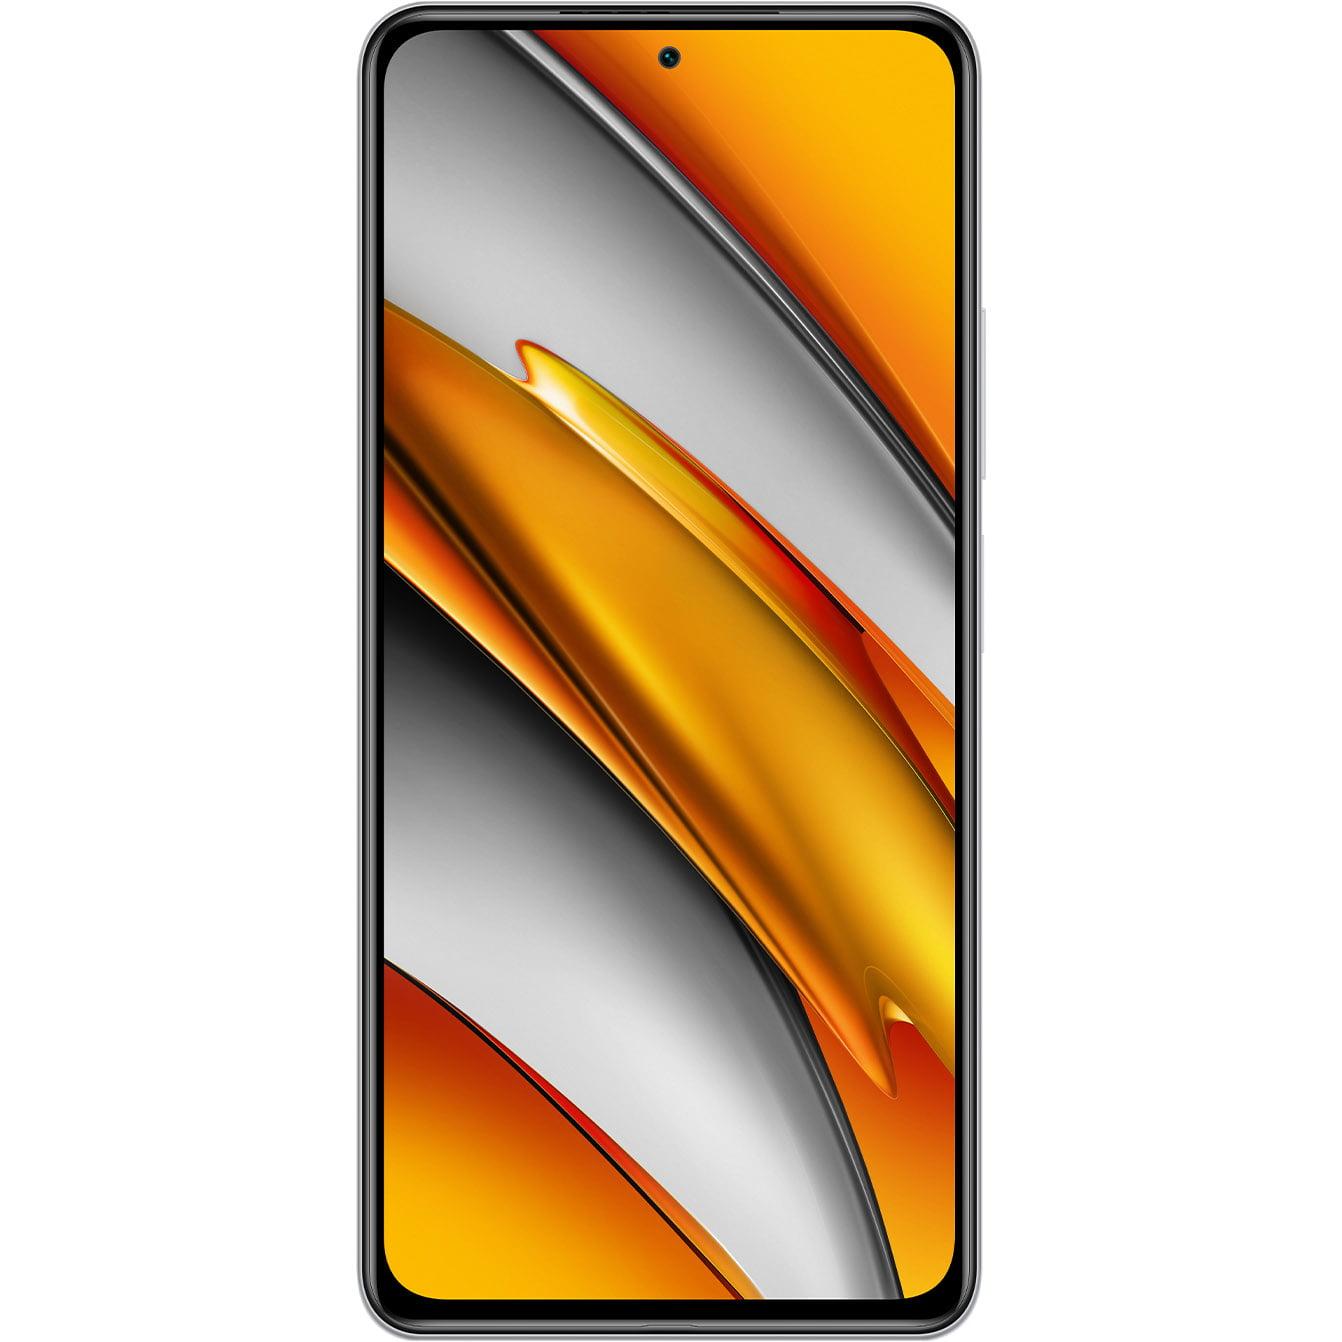 Telefon mobil Xiaomi Poco F3, Dual SIM, 128GB, 6GB RAM, 5G, Arctic White